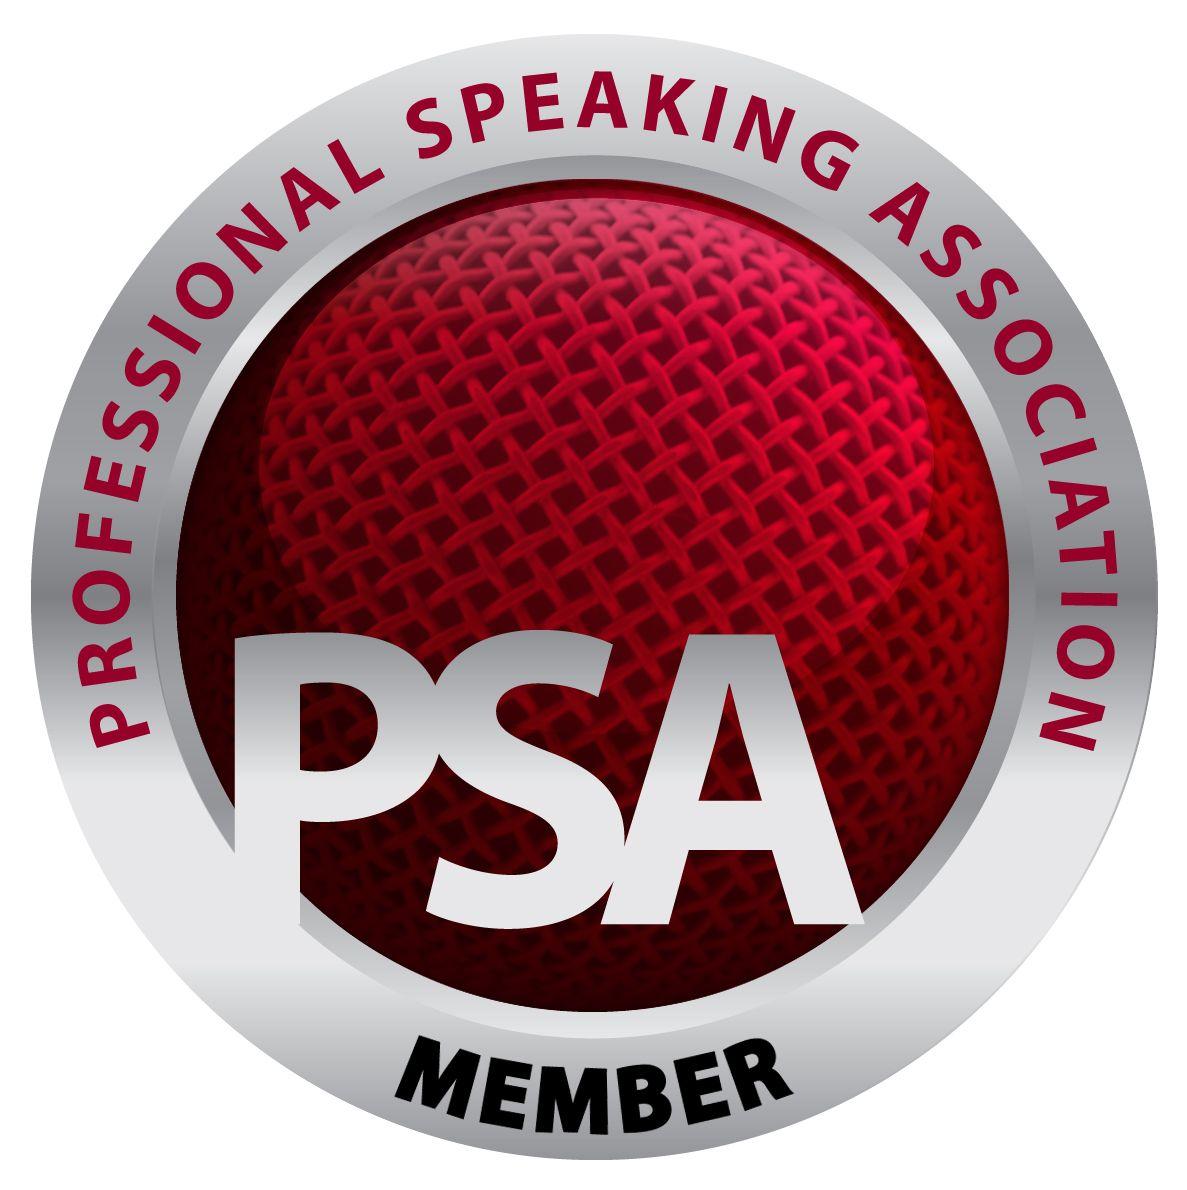 psa-member-logo-Hhigh-Def-1187.jpg